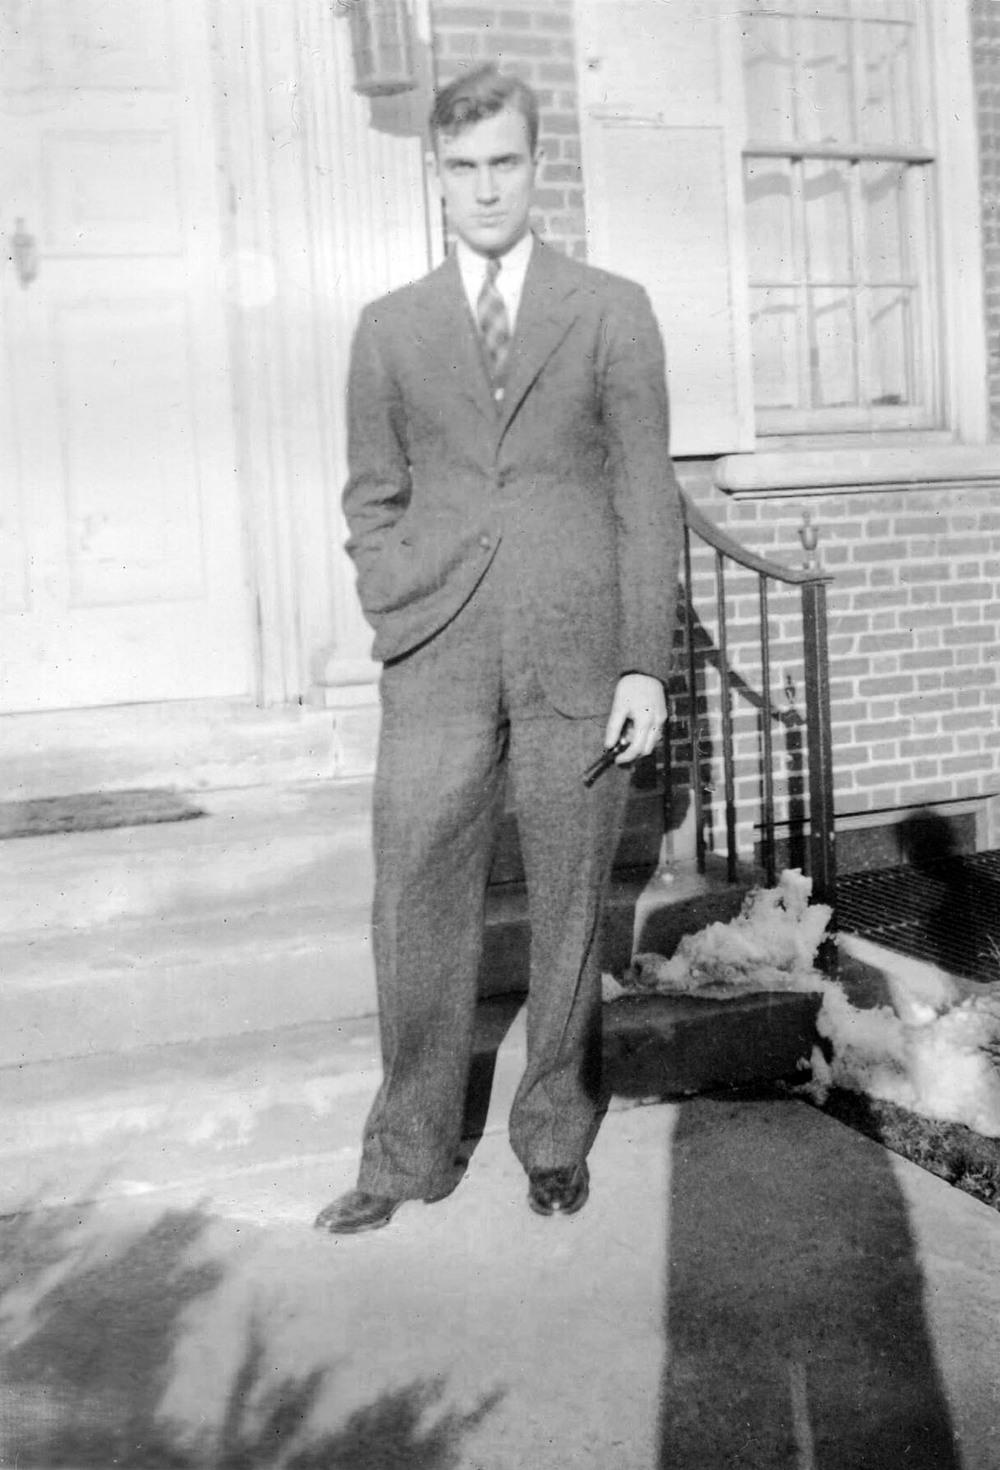 Wm. Lindsay Halpen 1939 - Philadelphia, PA